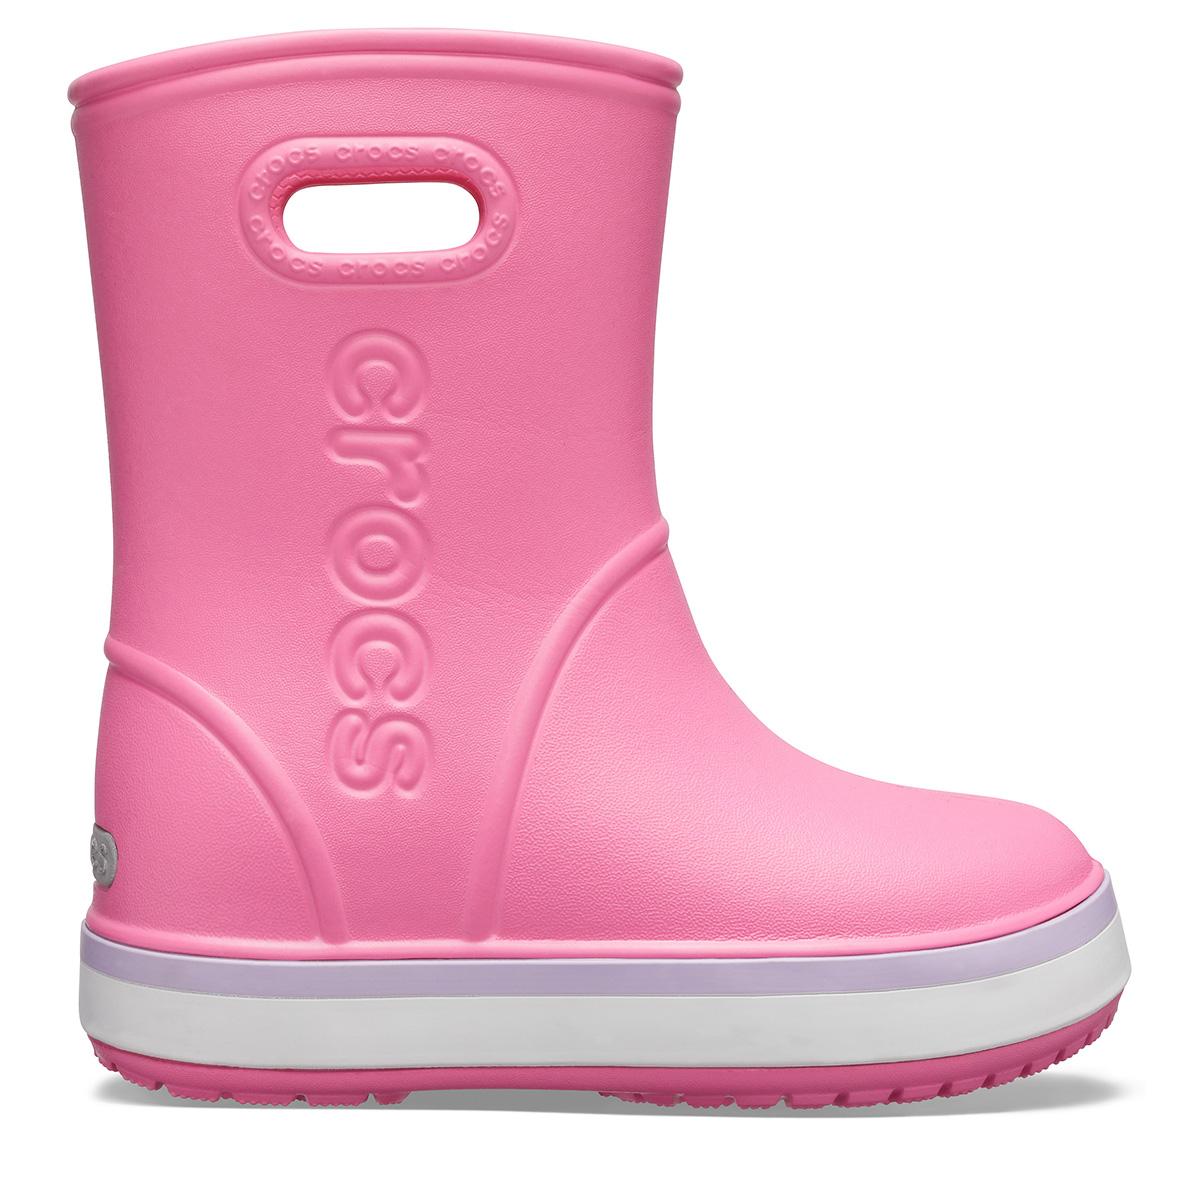 Crocband Rain Boot K - Pembe Limonata/Lavanta